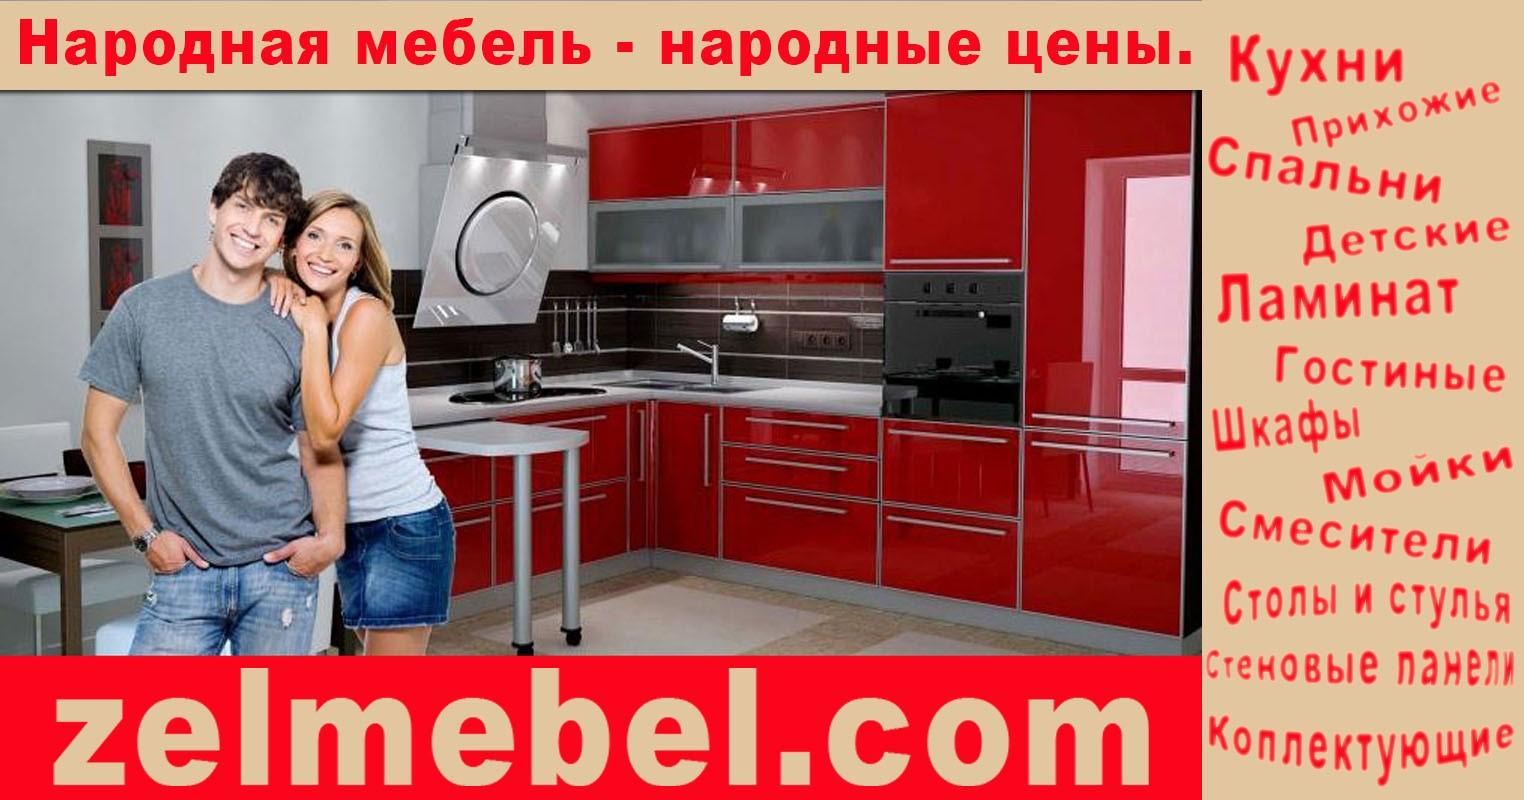 Кухни в Зеленограде, Химки, Солнечногорск